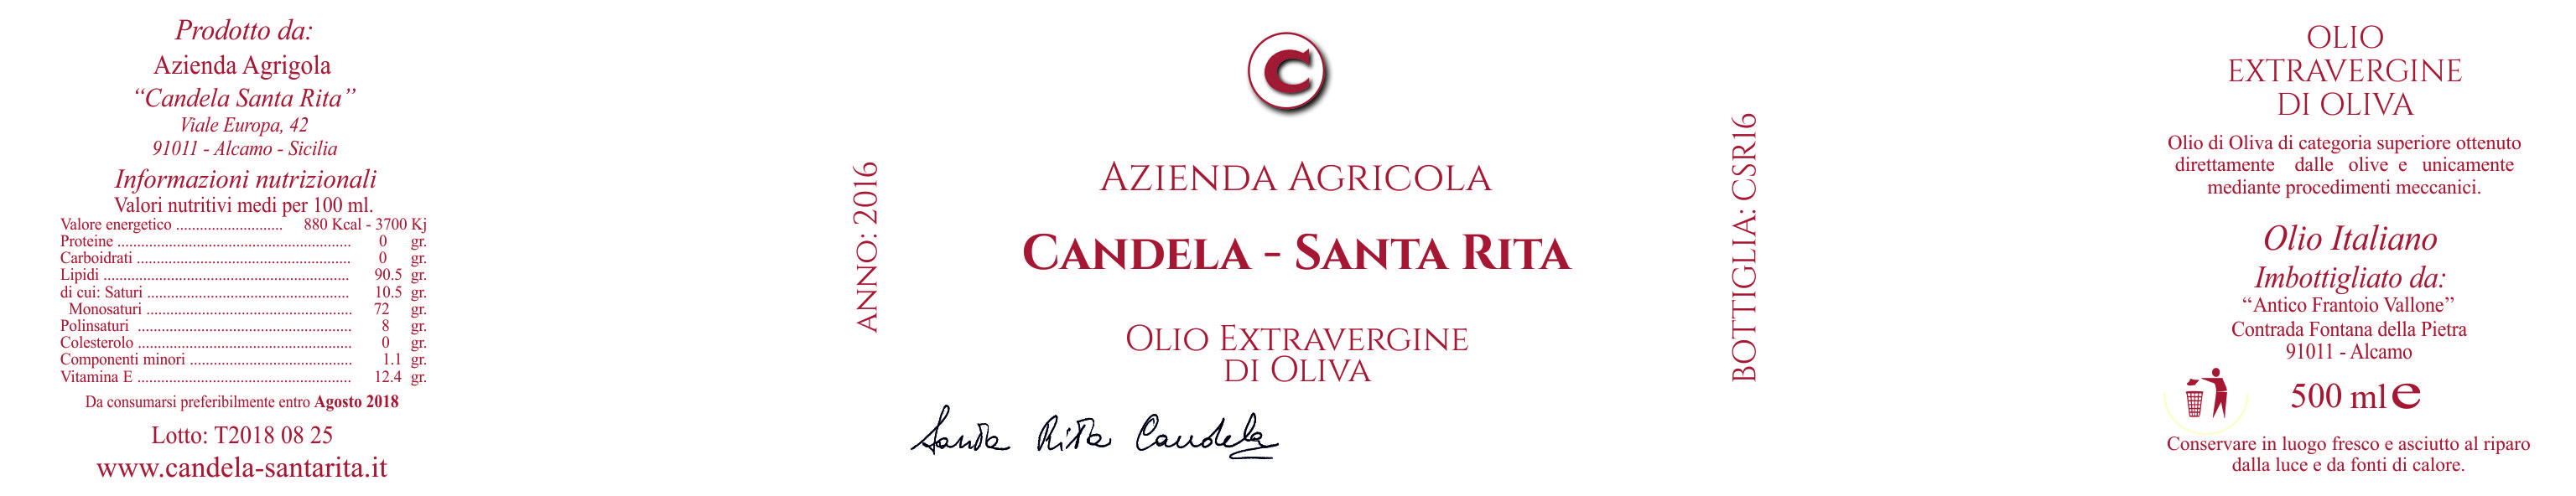 Candela-Santa Rita_Etichetta 2016.jpg